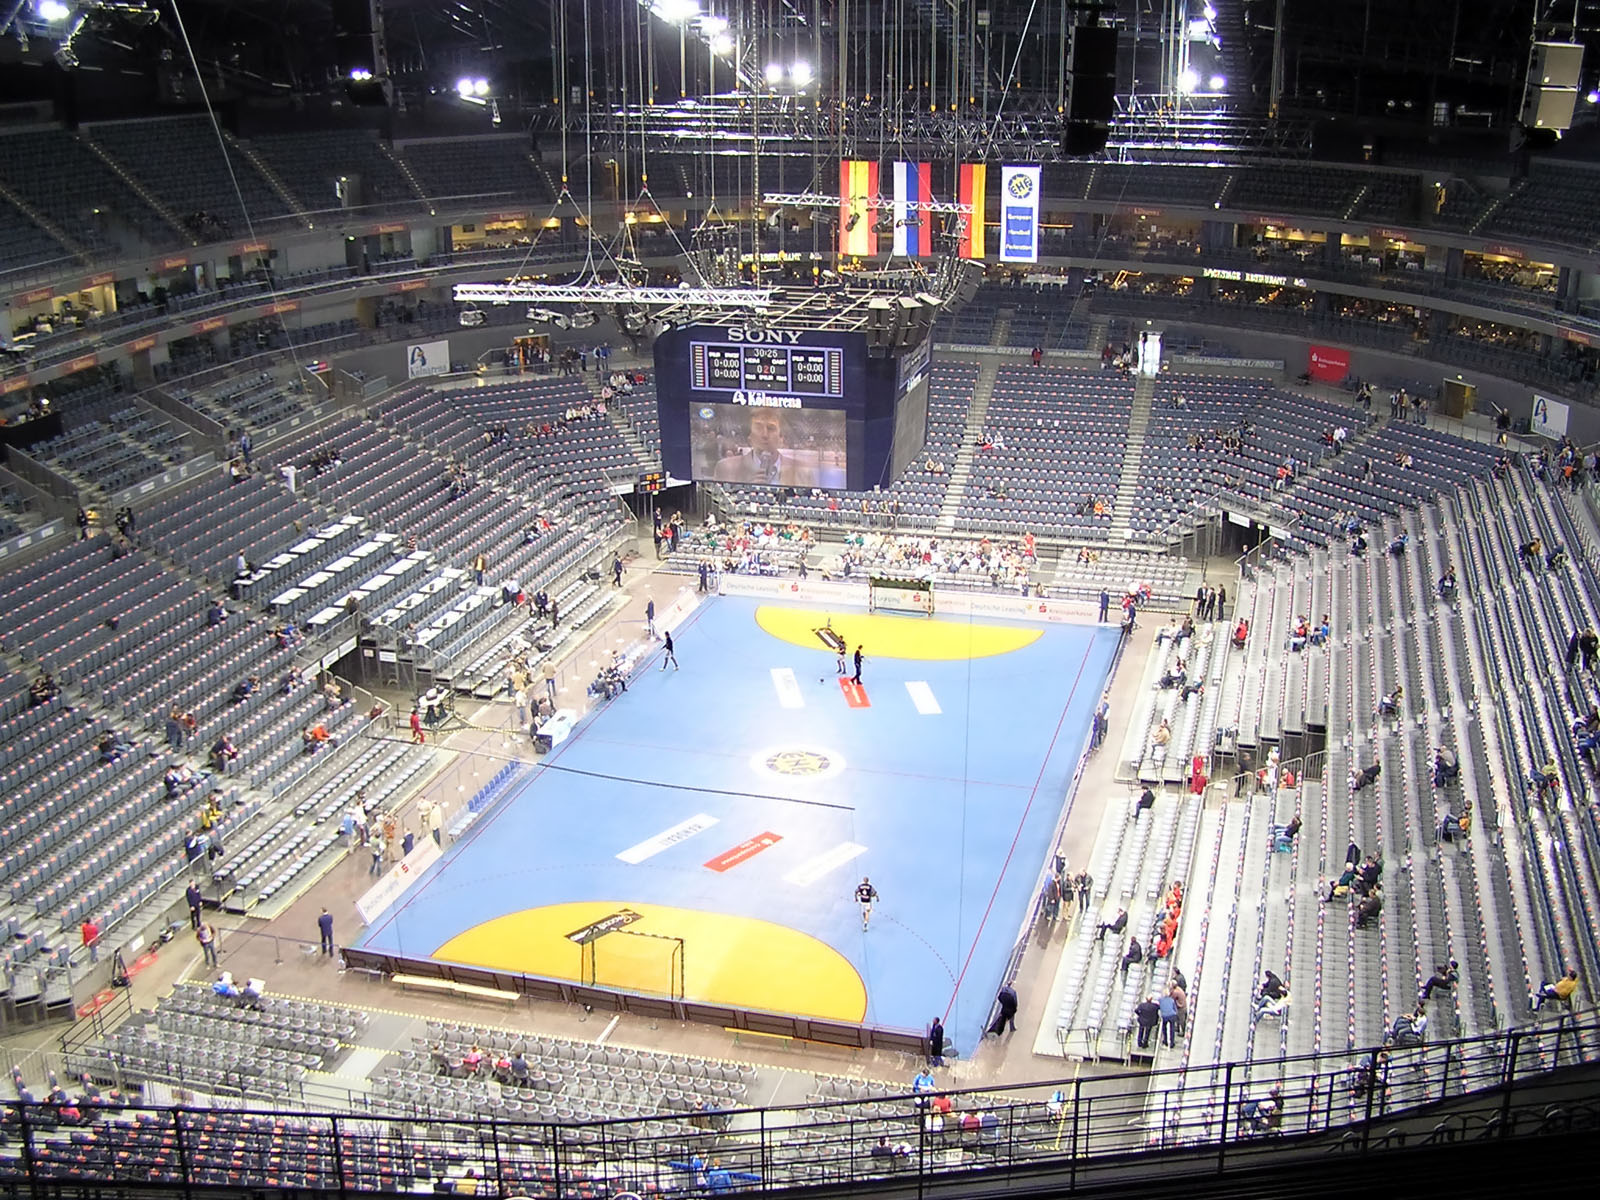 Lanxess Arena Kommende Veranstaltungen